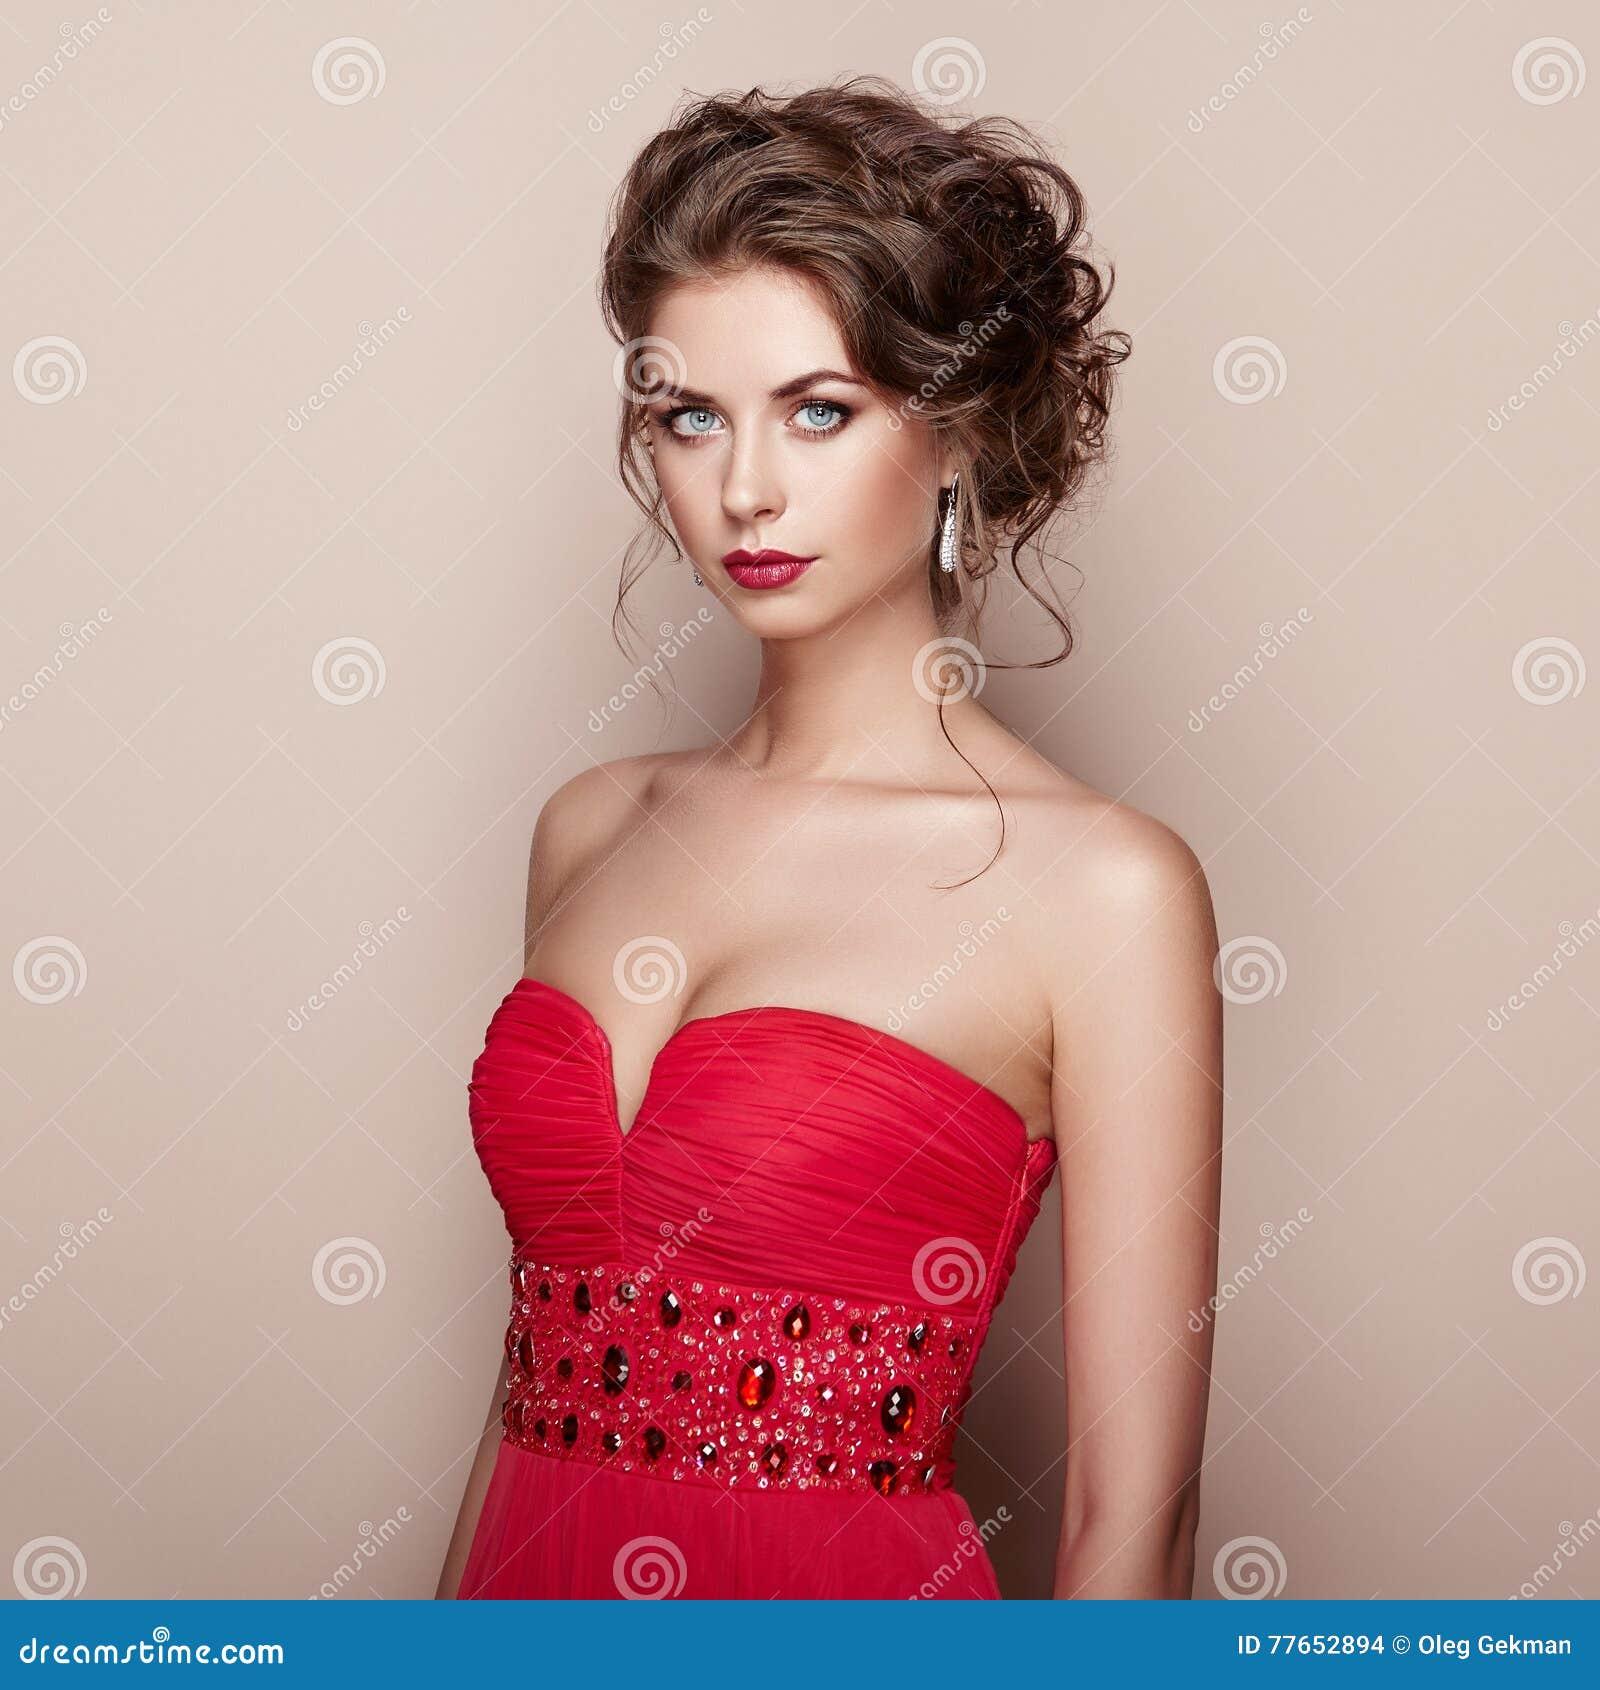 Classy And Glamorous Photo: Fashion Portrait Of Beautiful Woman In Elegant Dress Stock